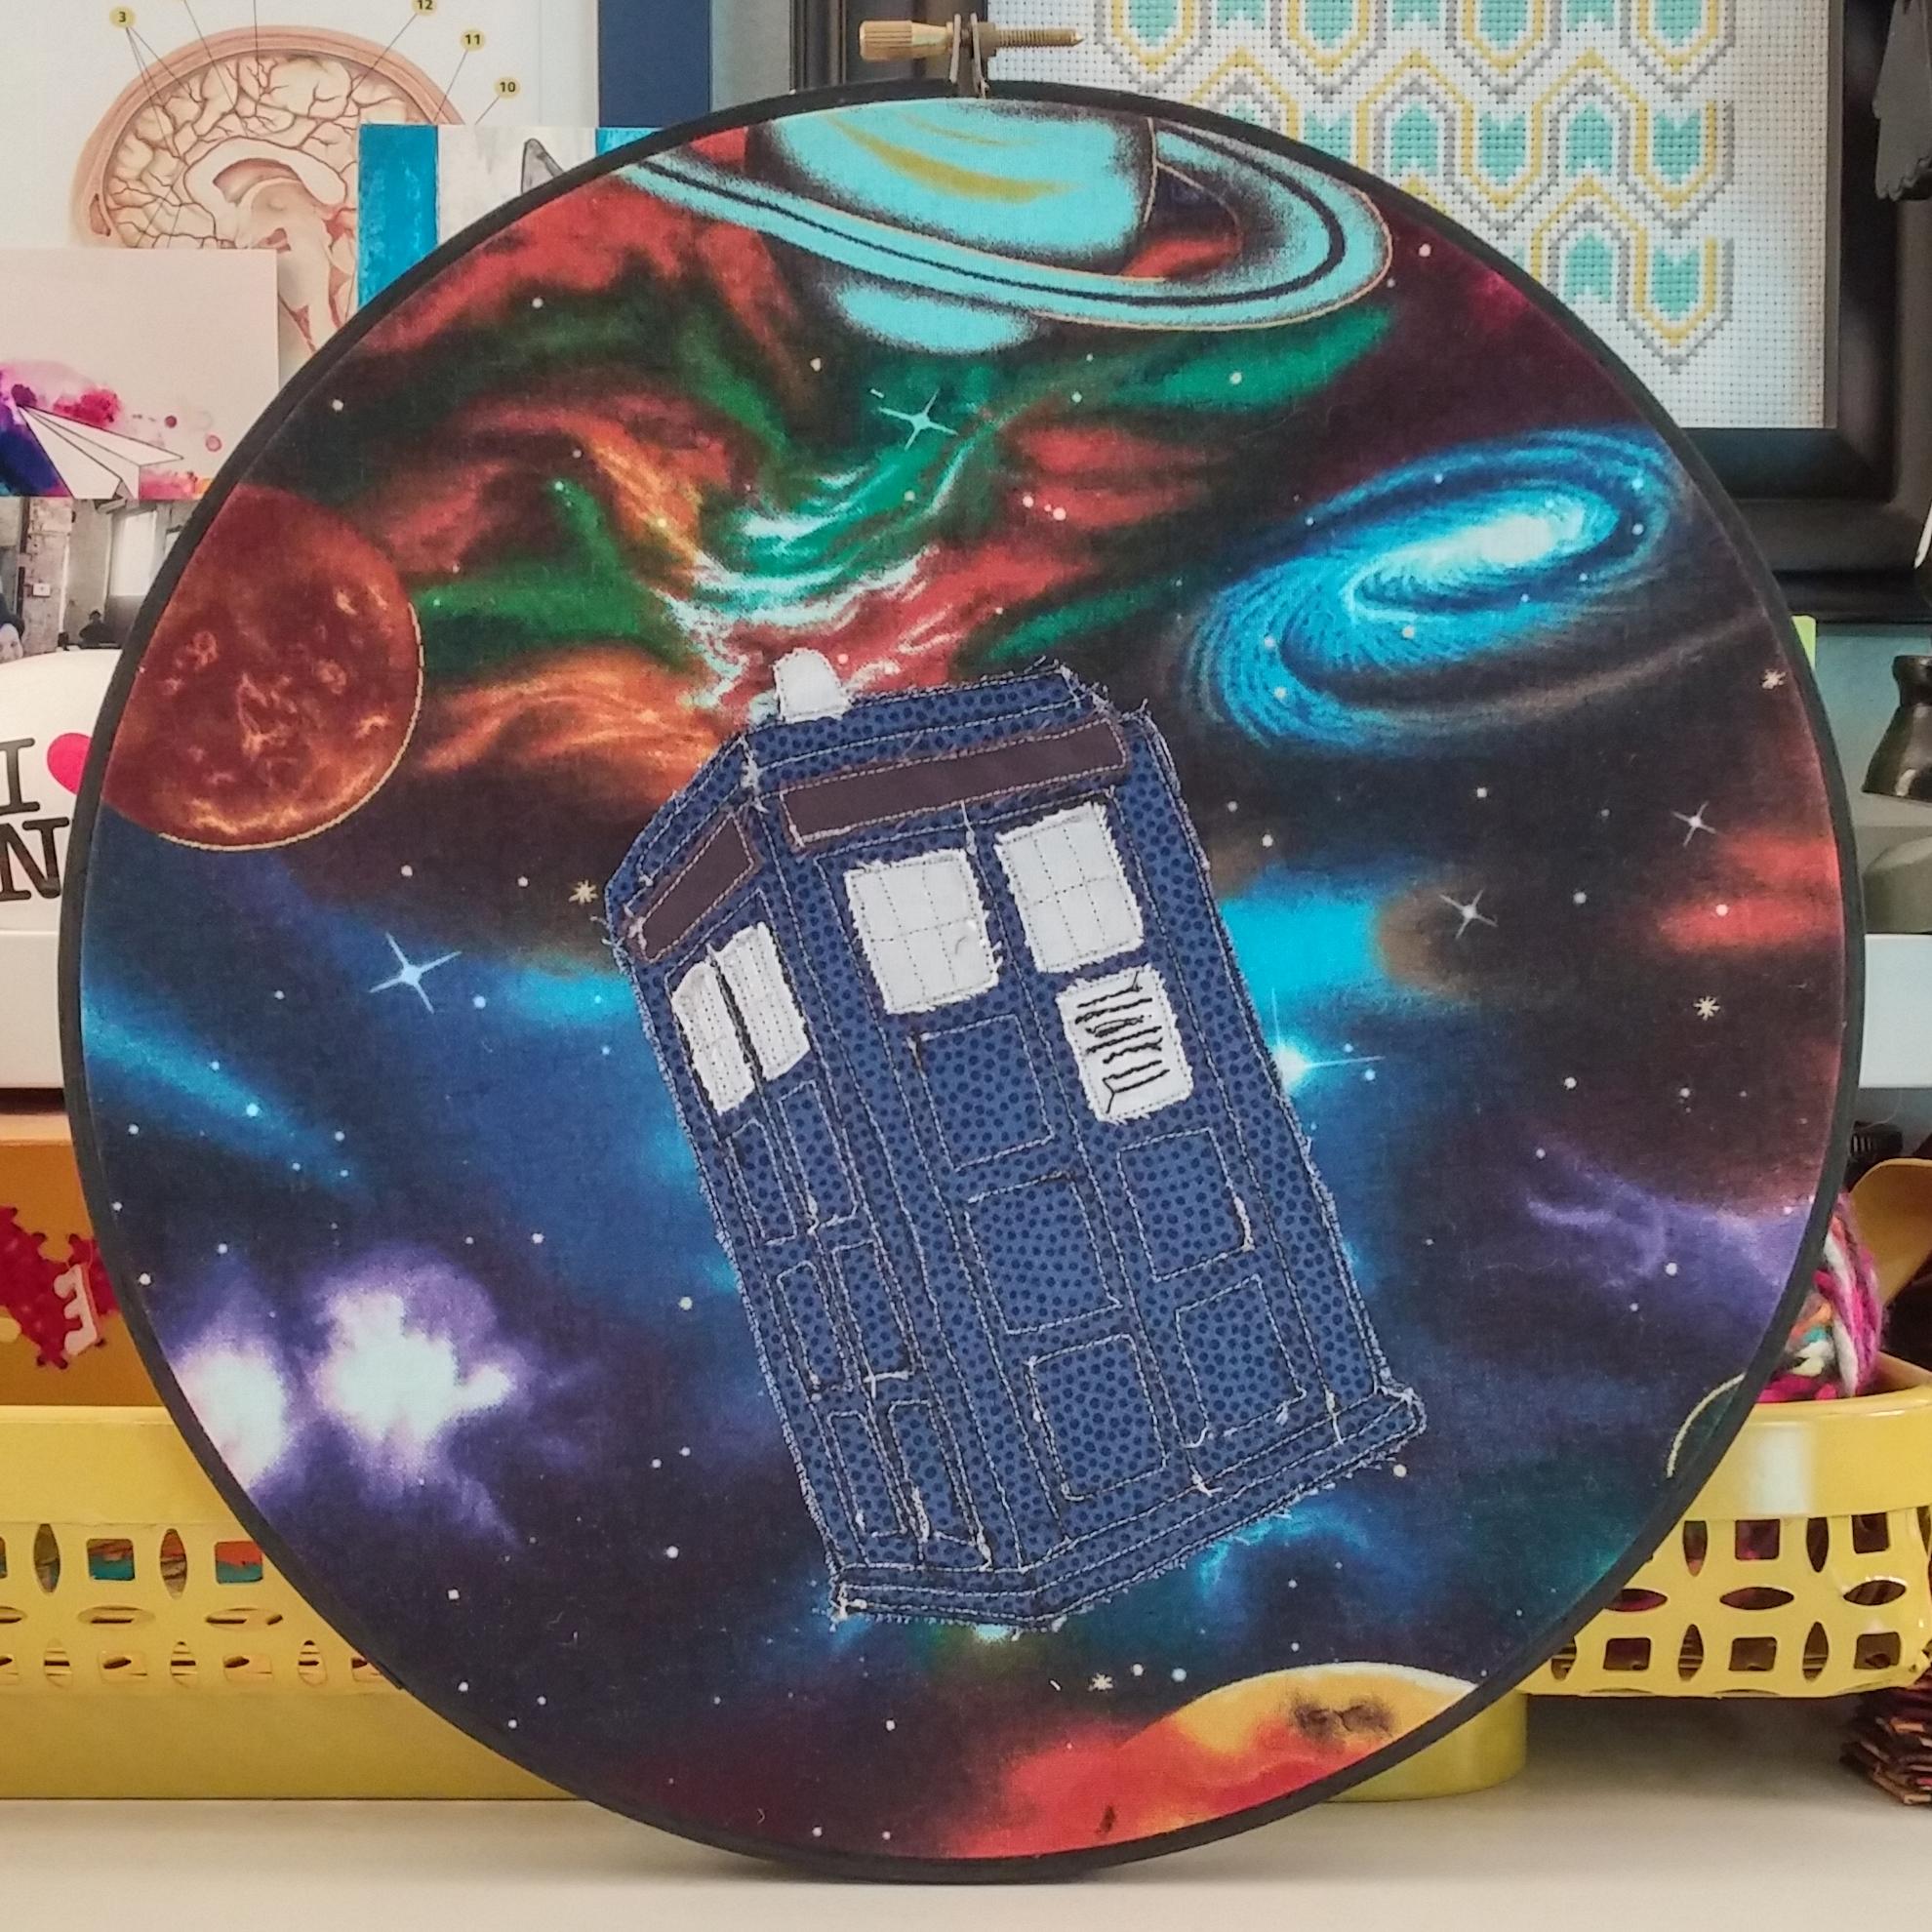 Teresa Millies' TARDIS hand embroidery